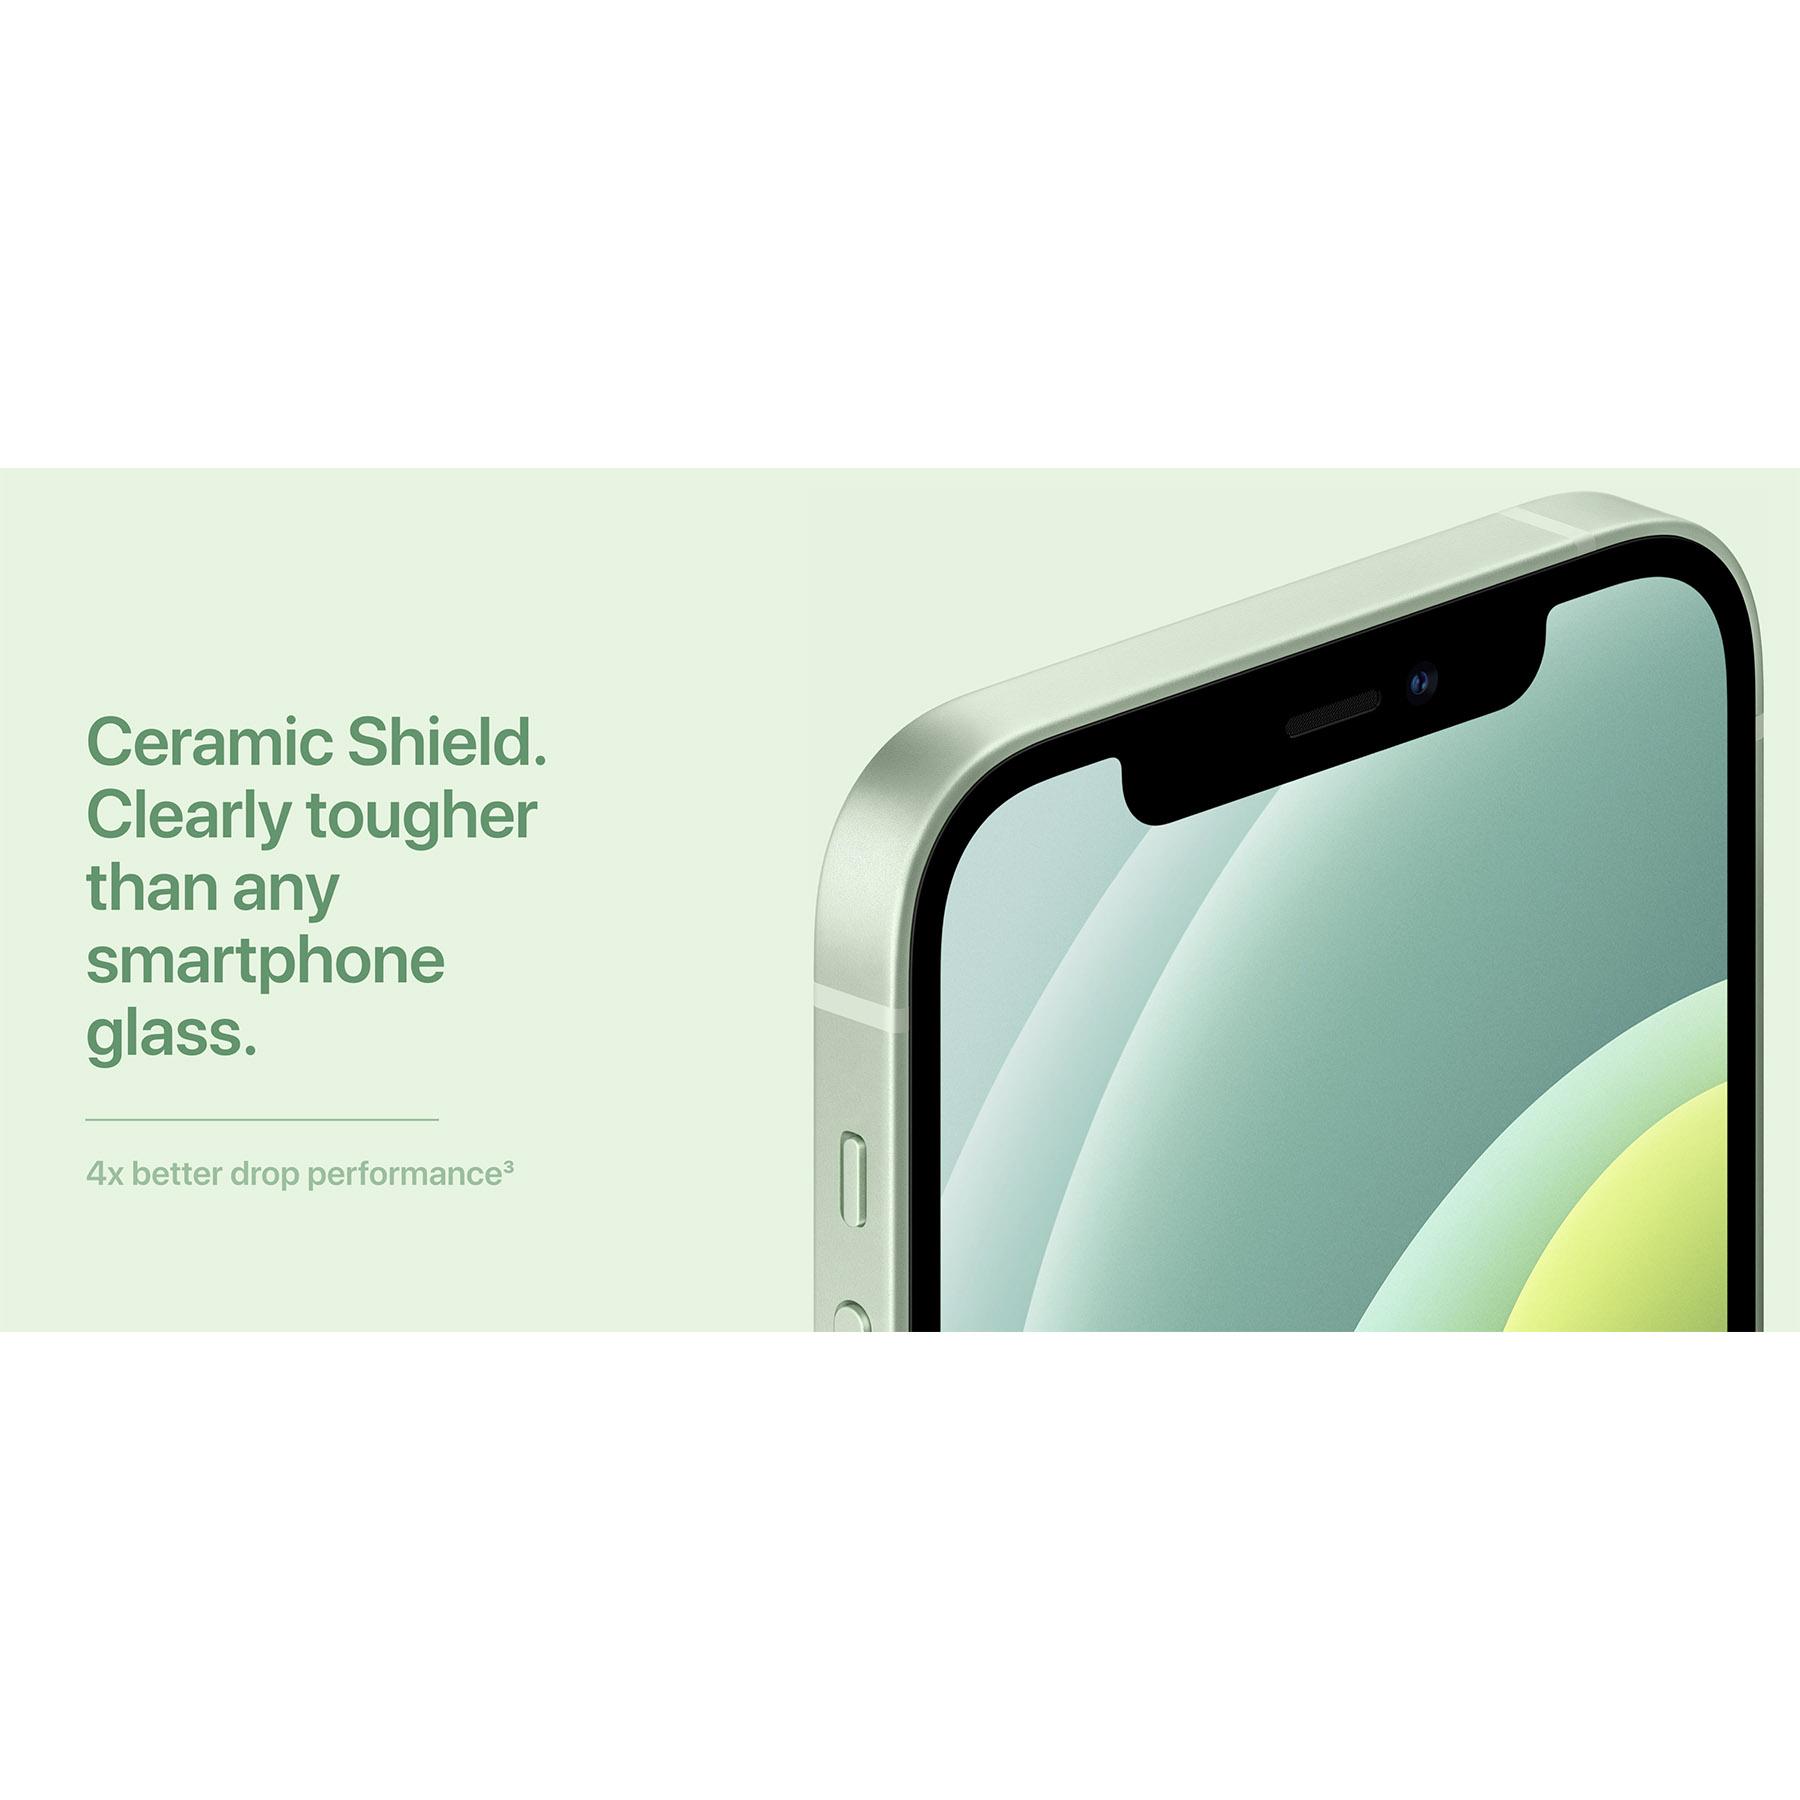 گوشی موبایل اپل مدل iPhone 12 A2404 دو سیم کارت ظرفیت 128 گیگابایت  main 1 14